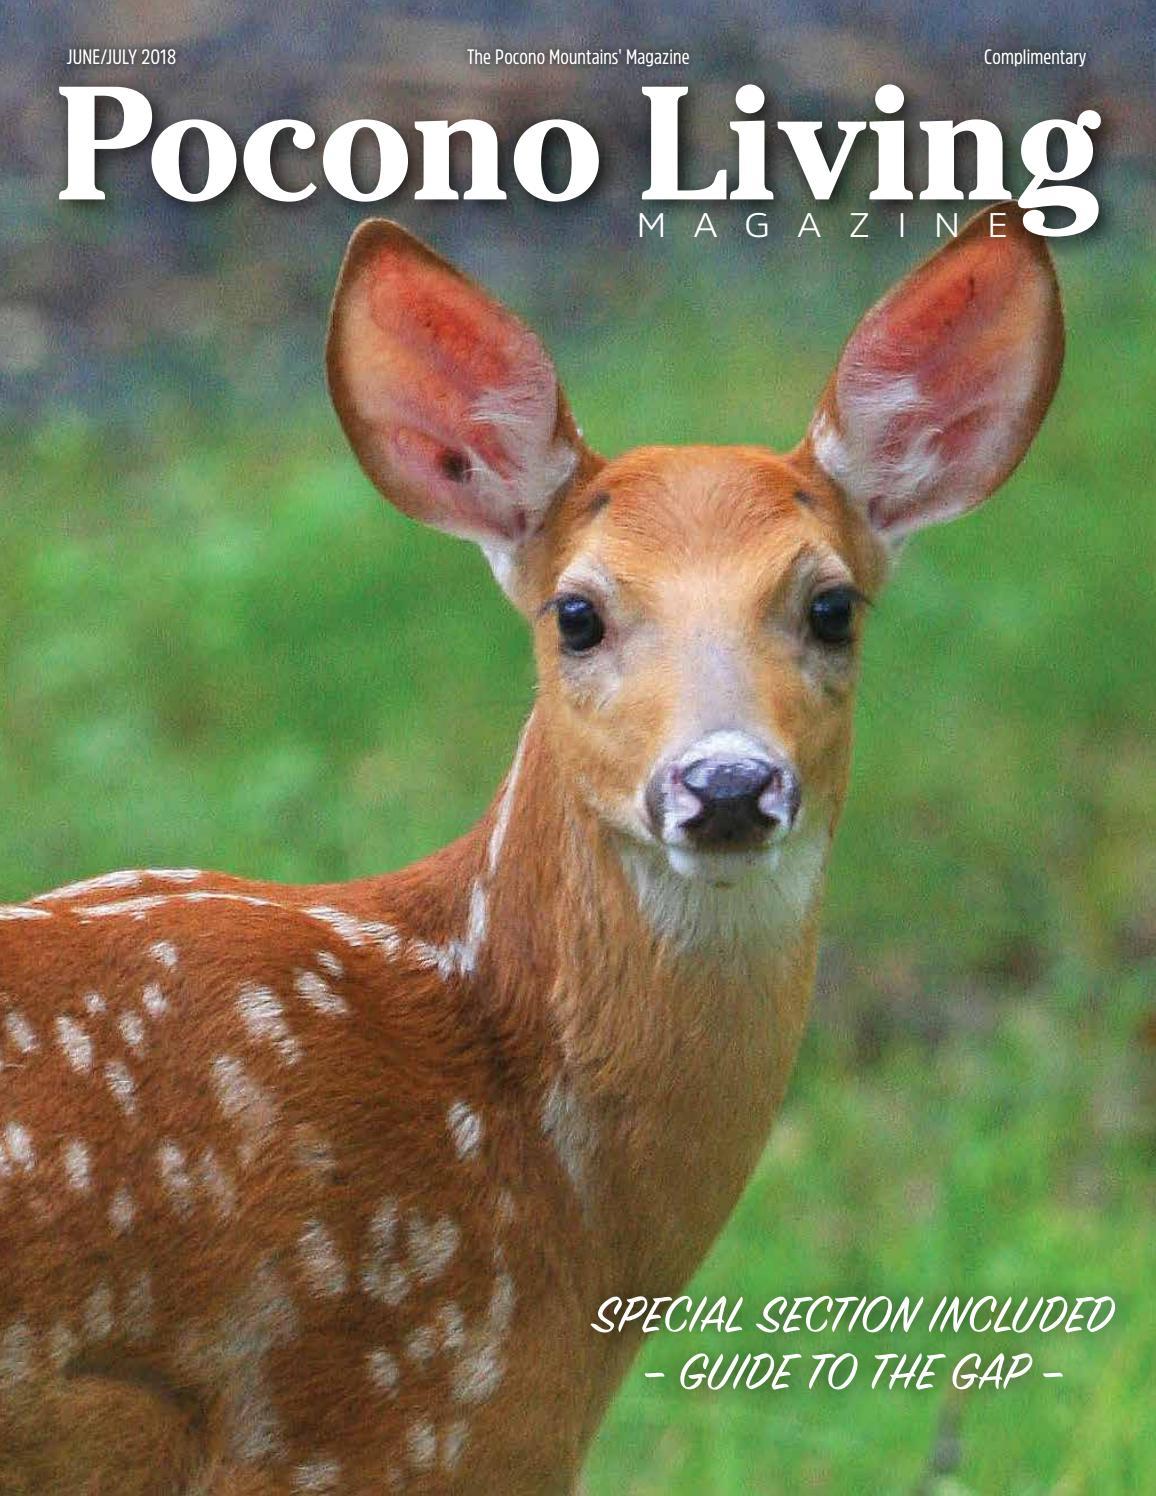 June / July 2018 Pocono Living Magazine by LARRY SEBRING - issuu